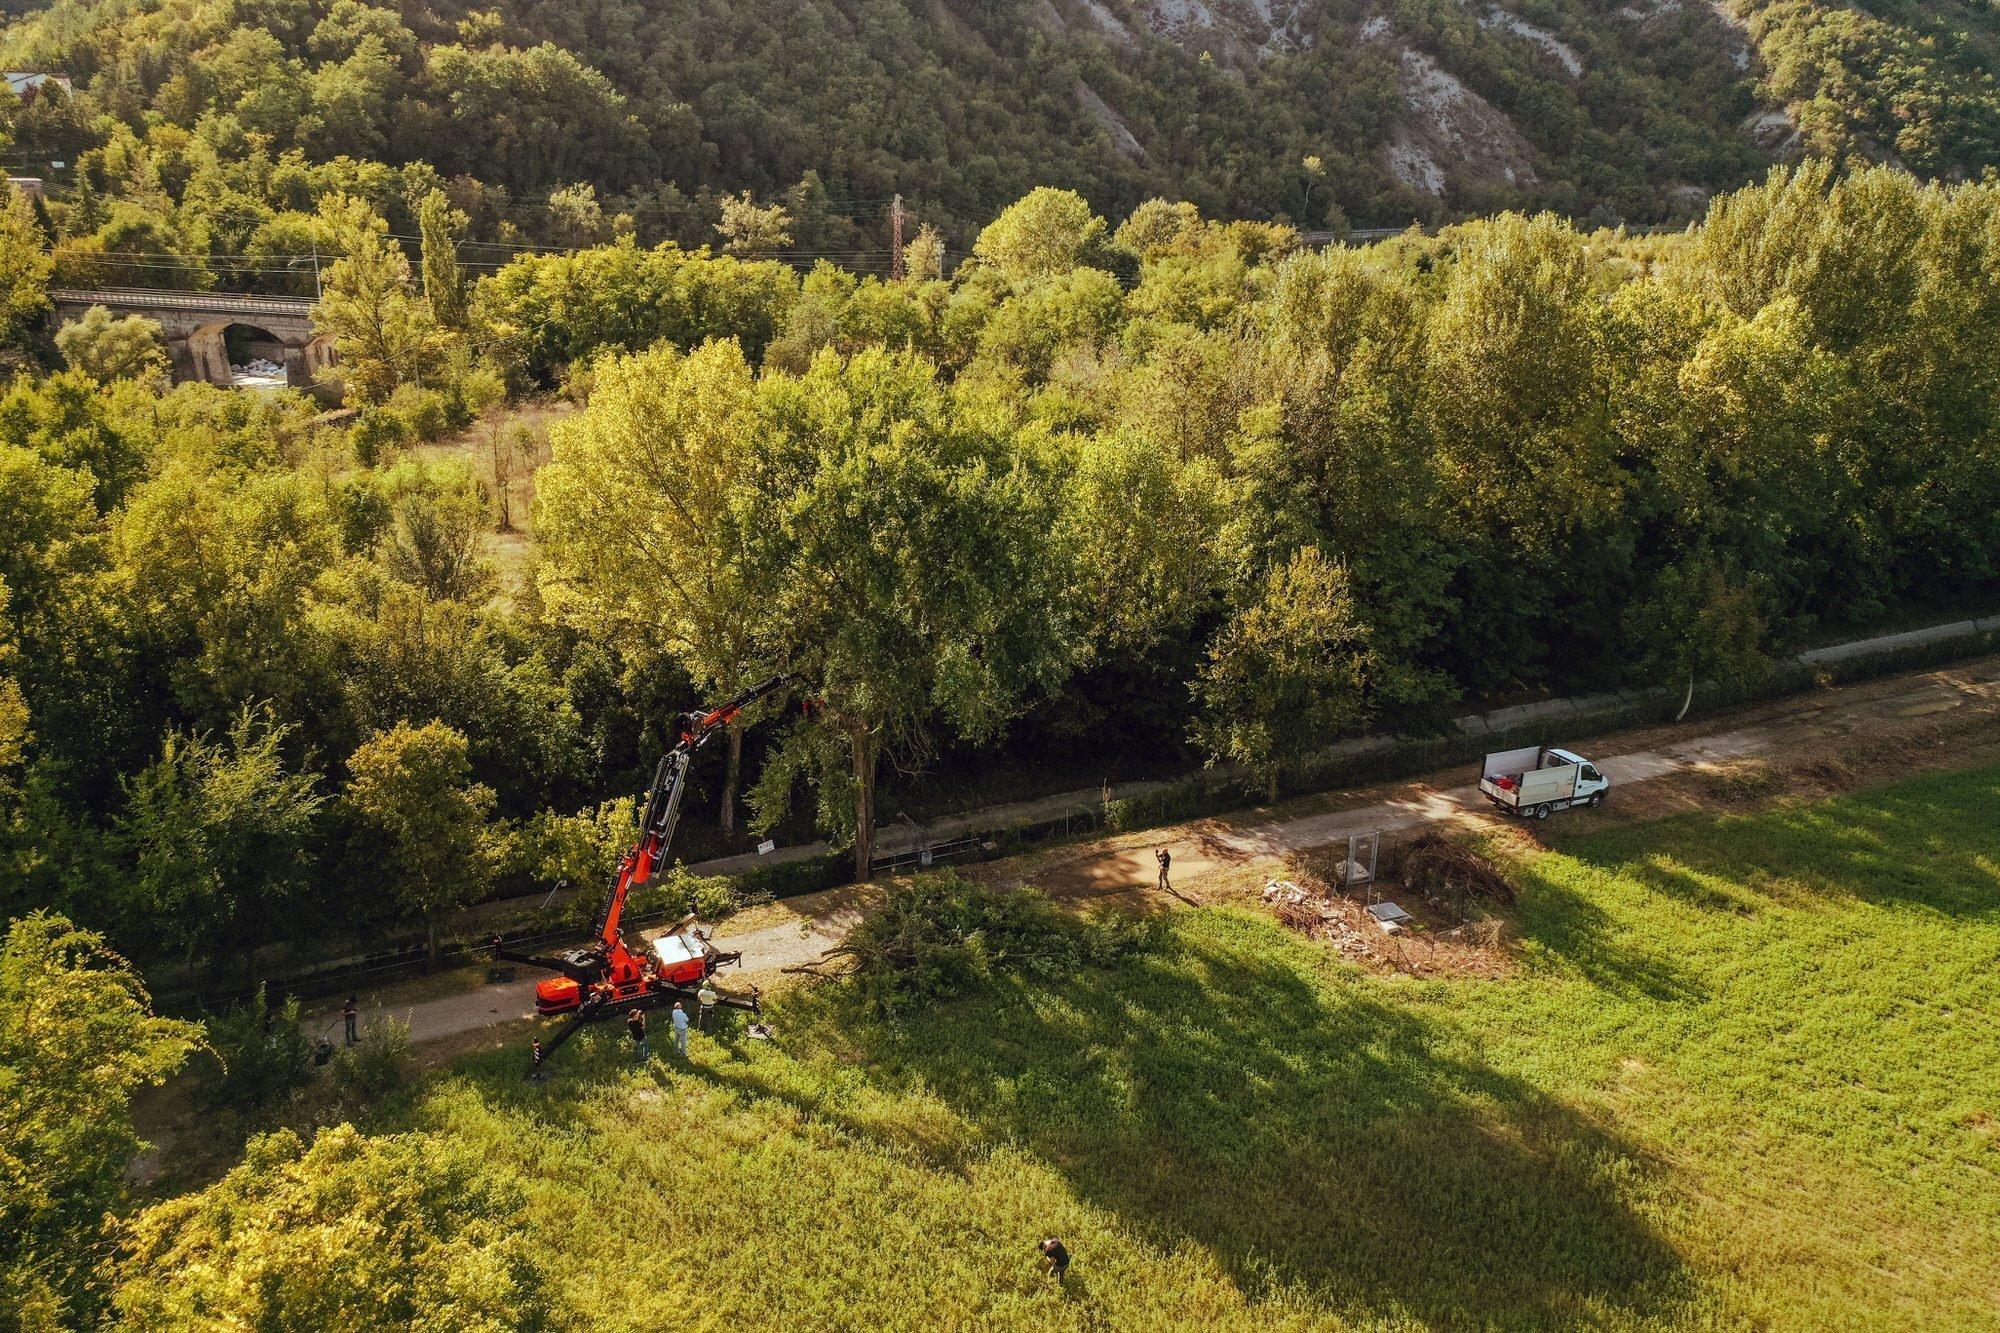 jf545 Kran für Grünflächenpflege